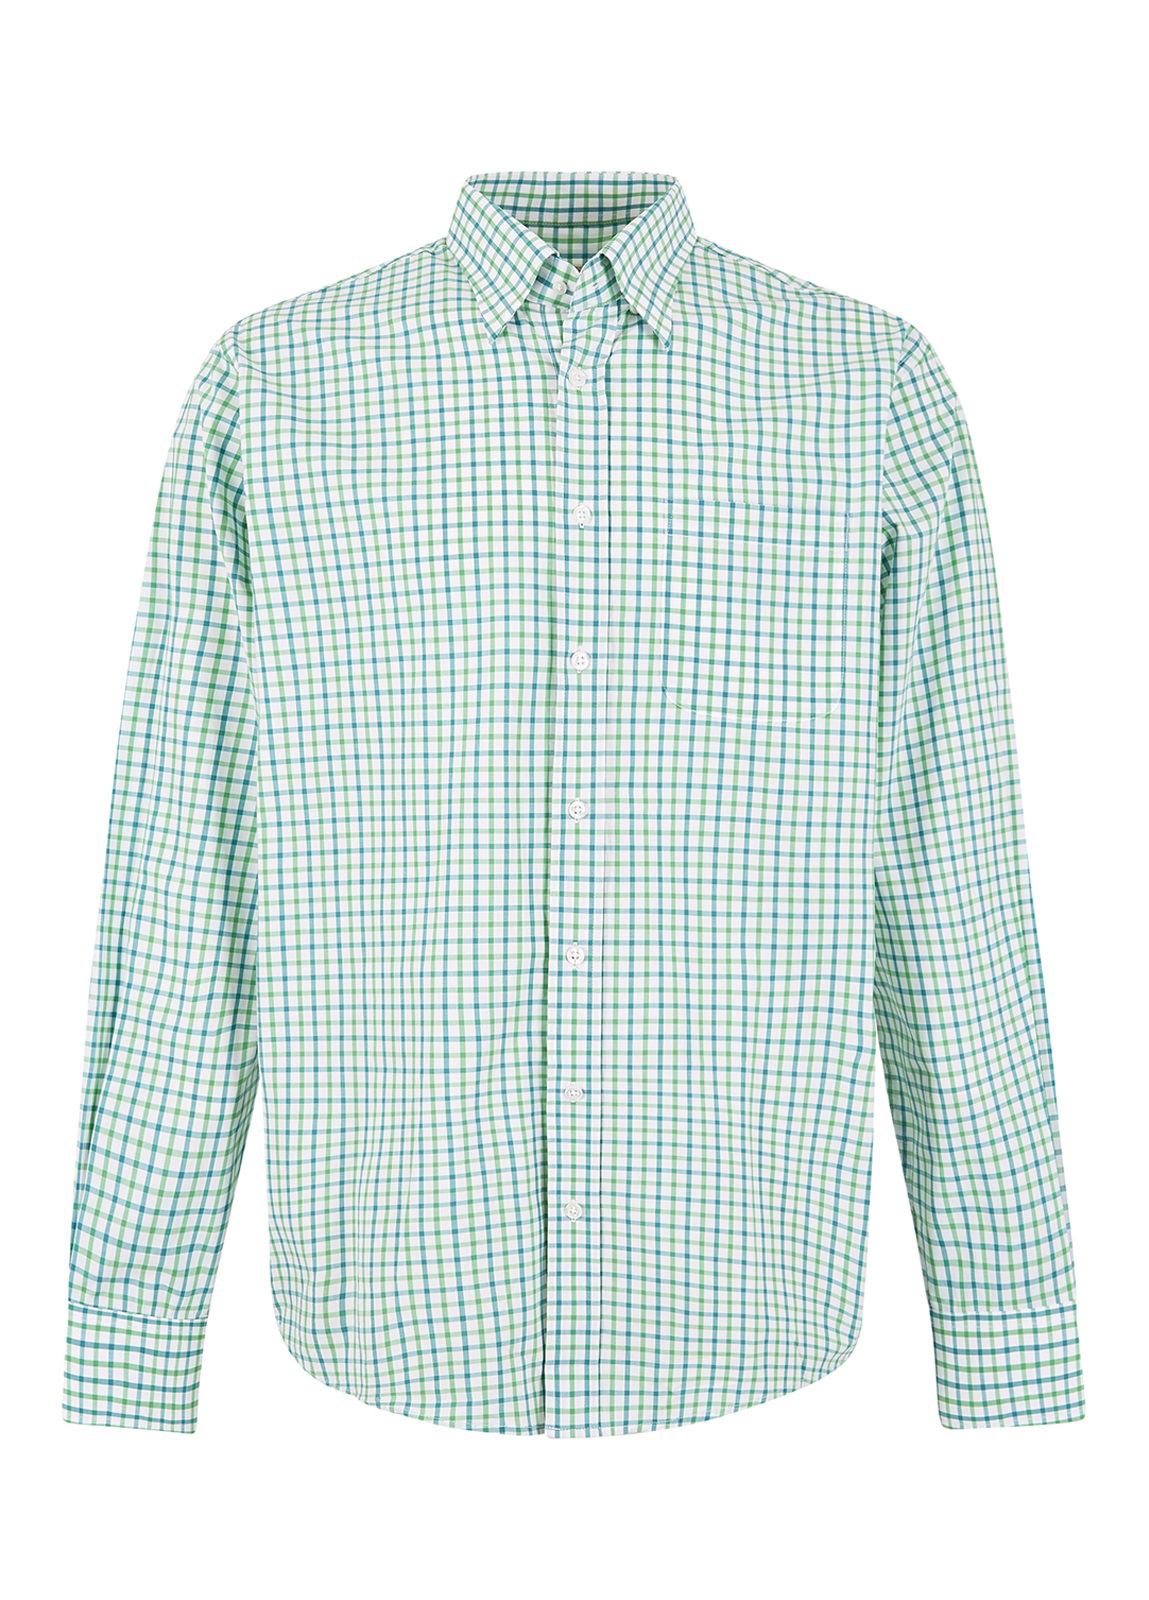 Dubarry_Frenchpark Shirt - Rowan_Image_2